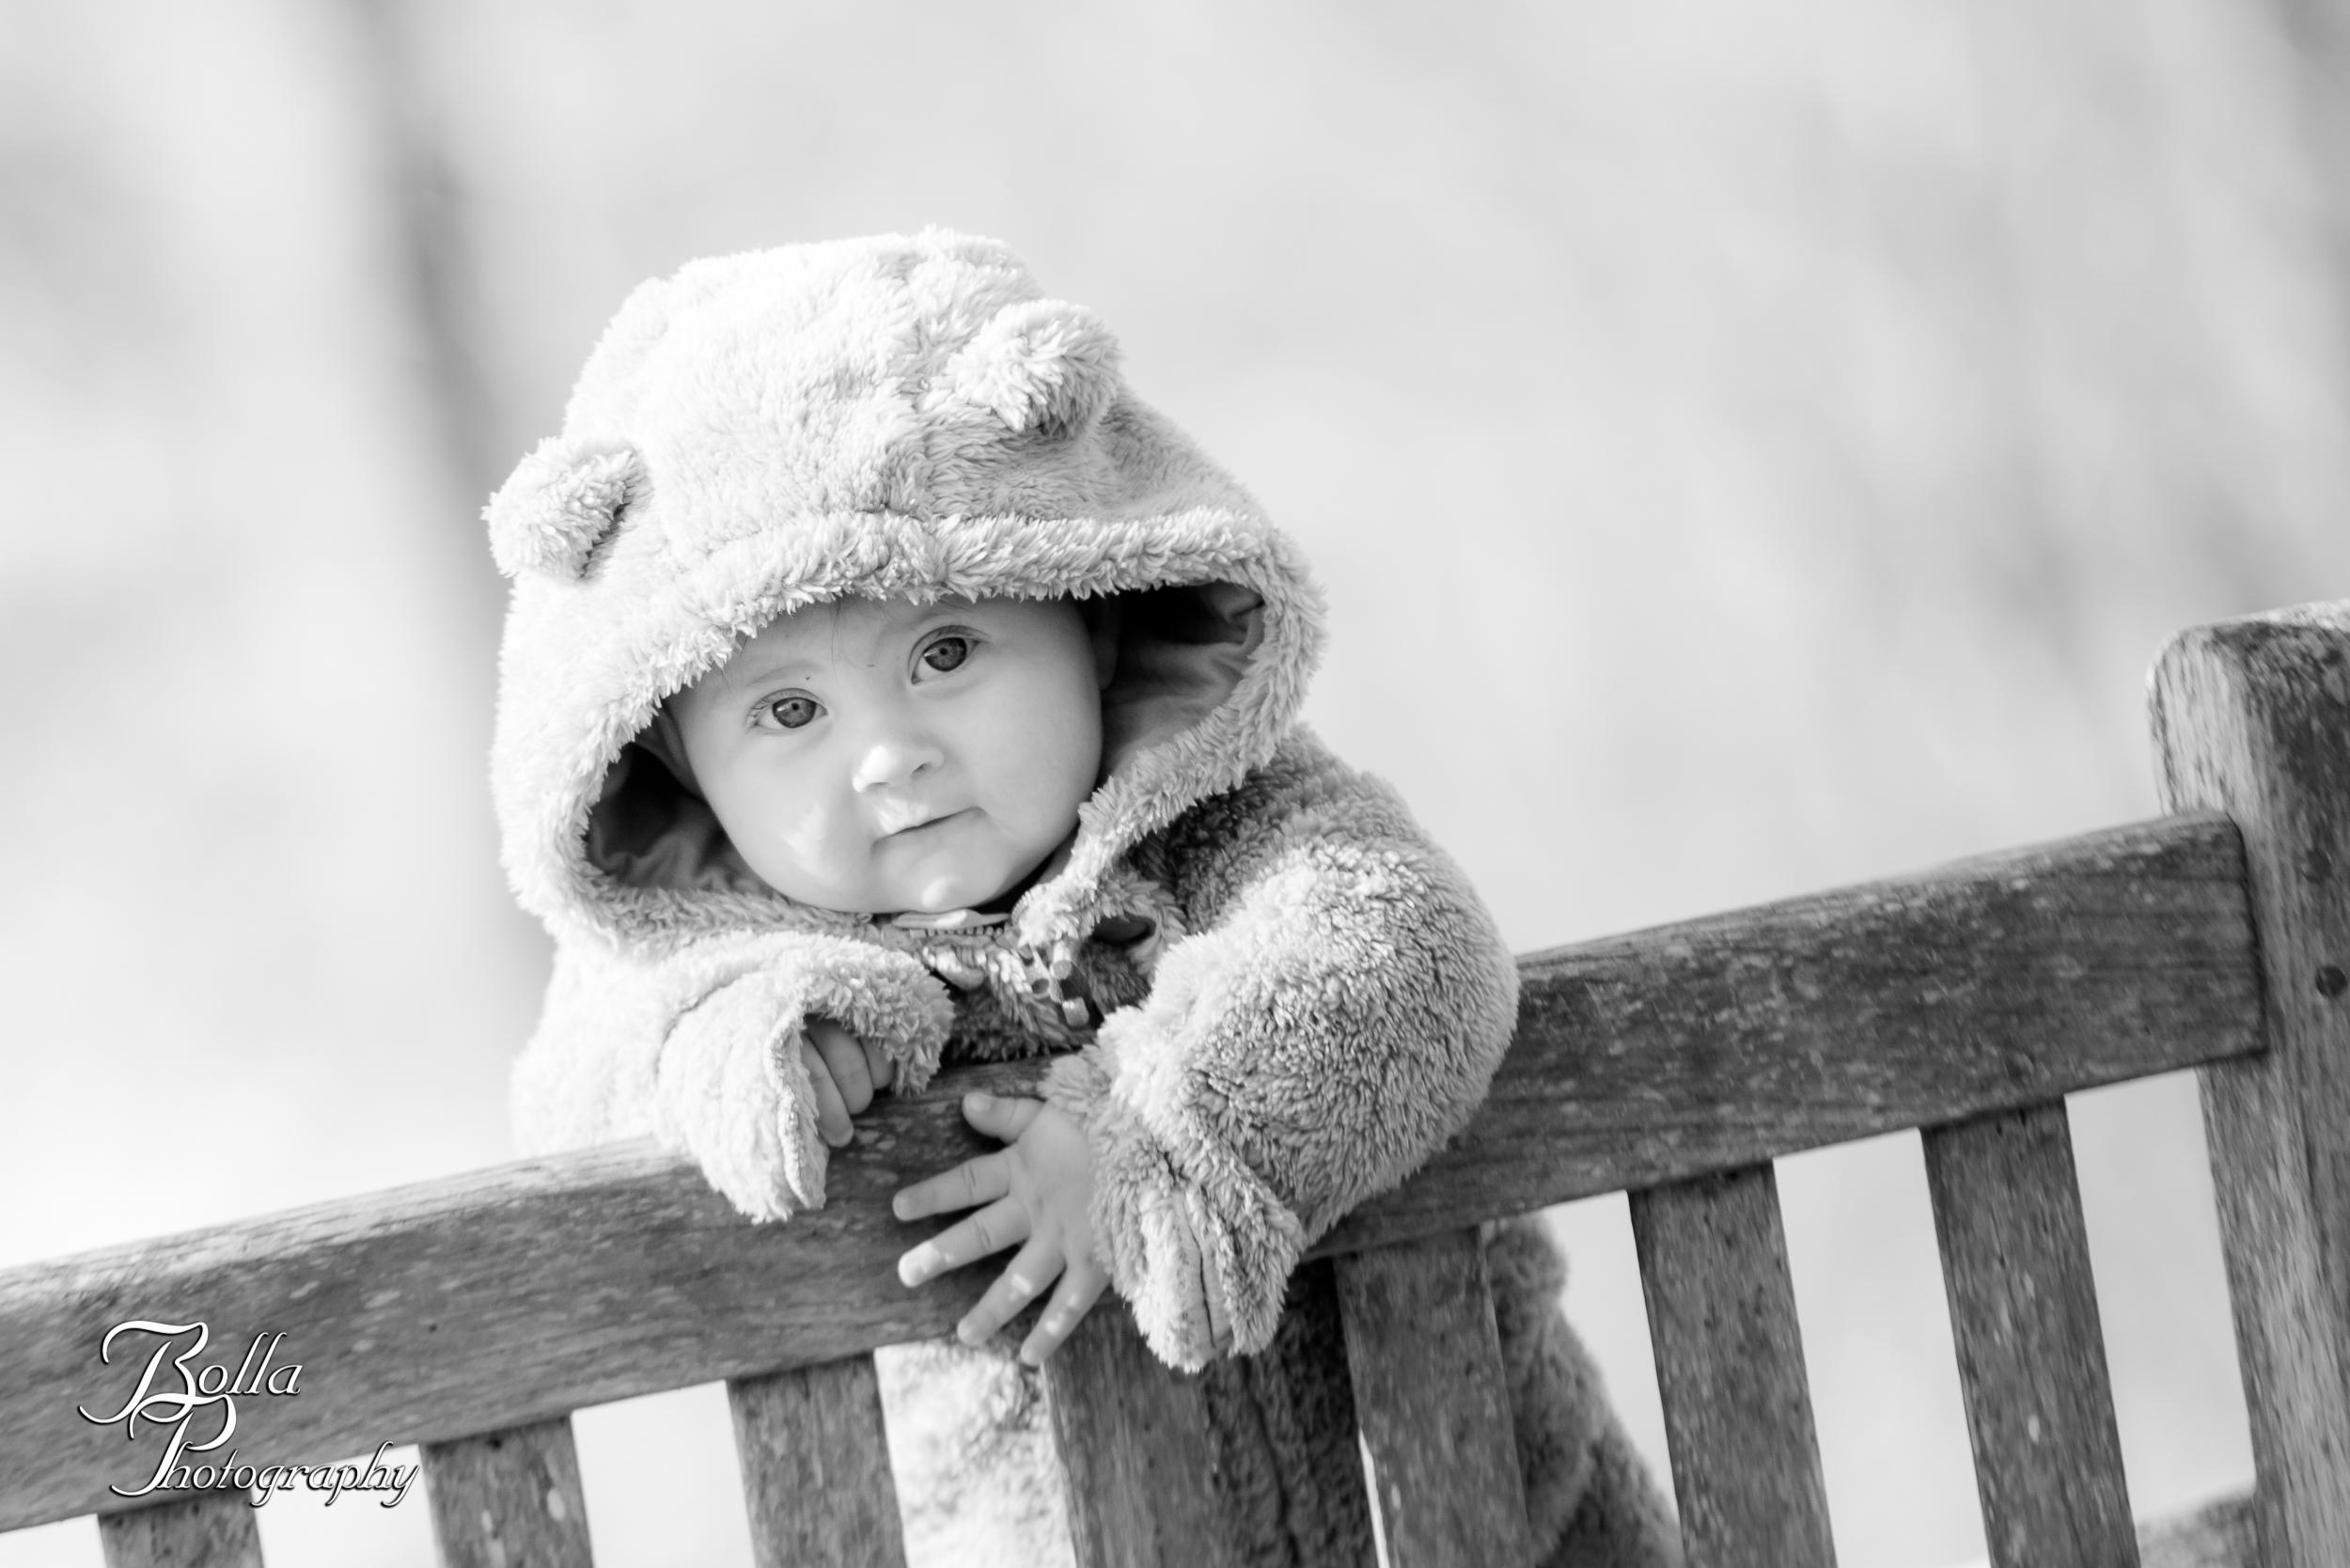 20170101_Bolla photography edwardsville wedding newborn baby photographer st louis weddings babies-2.jpg